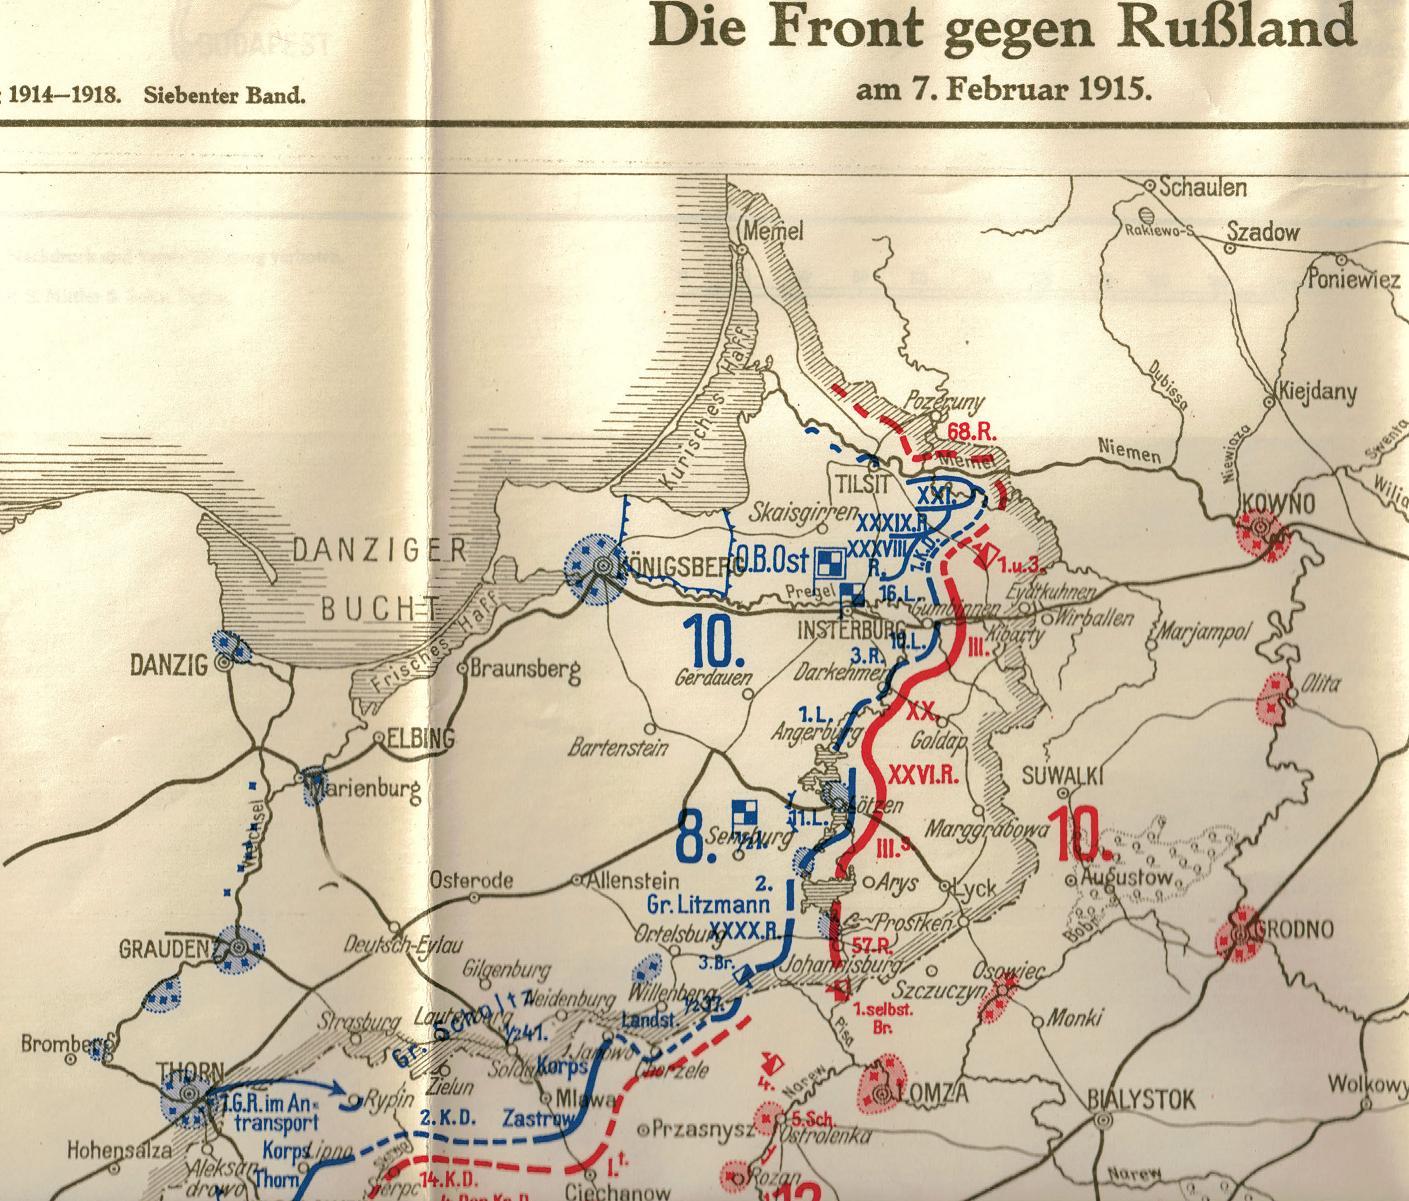 1915-01-28 LIR84_Front gegen Russland 7_Feb_1915